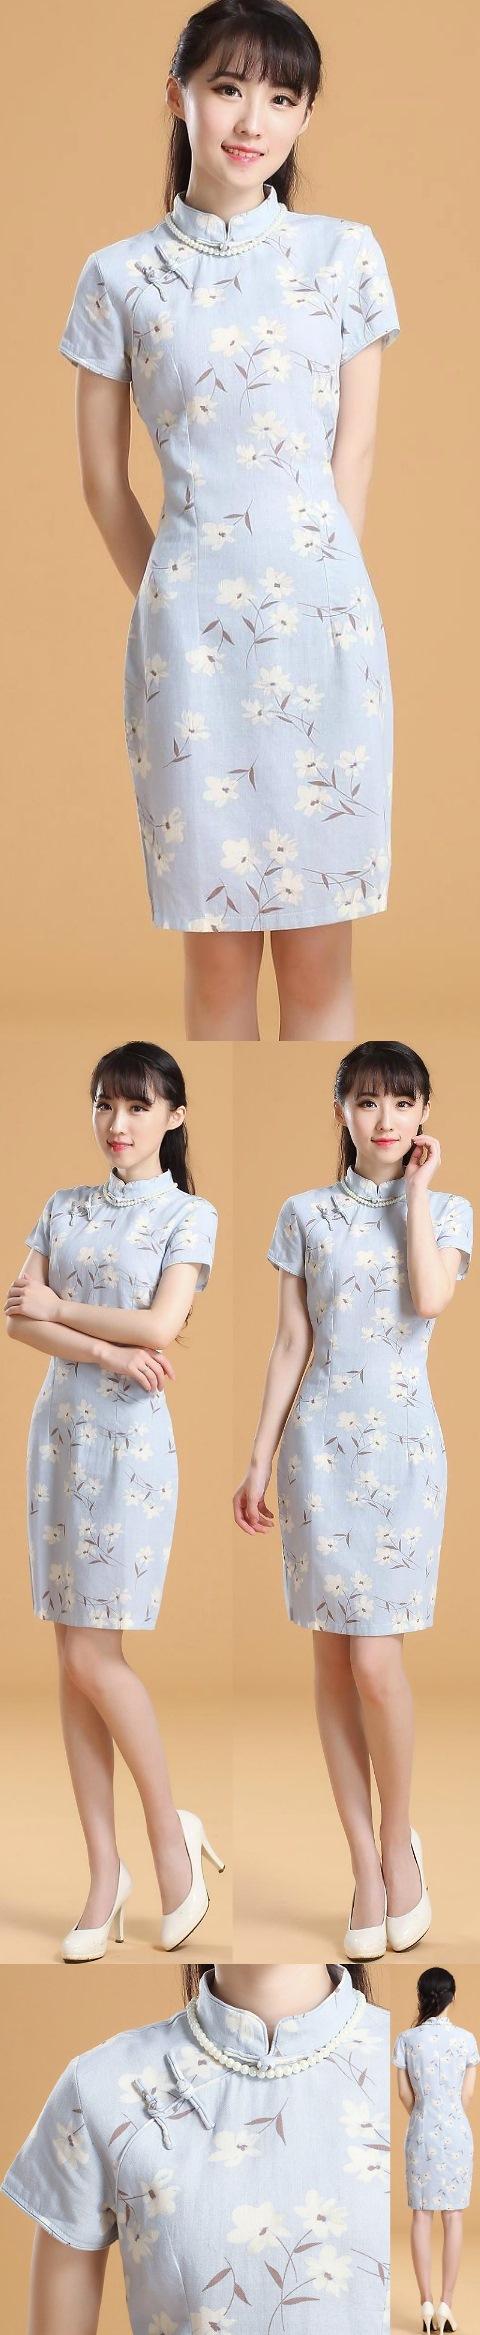 Mid-length Linen Printing Cheongsam Dress (RM)